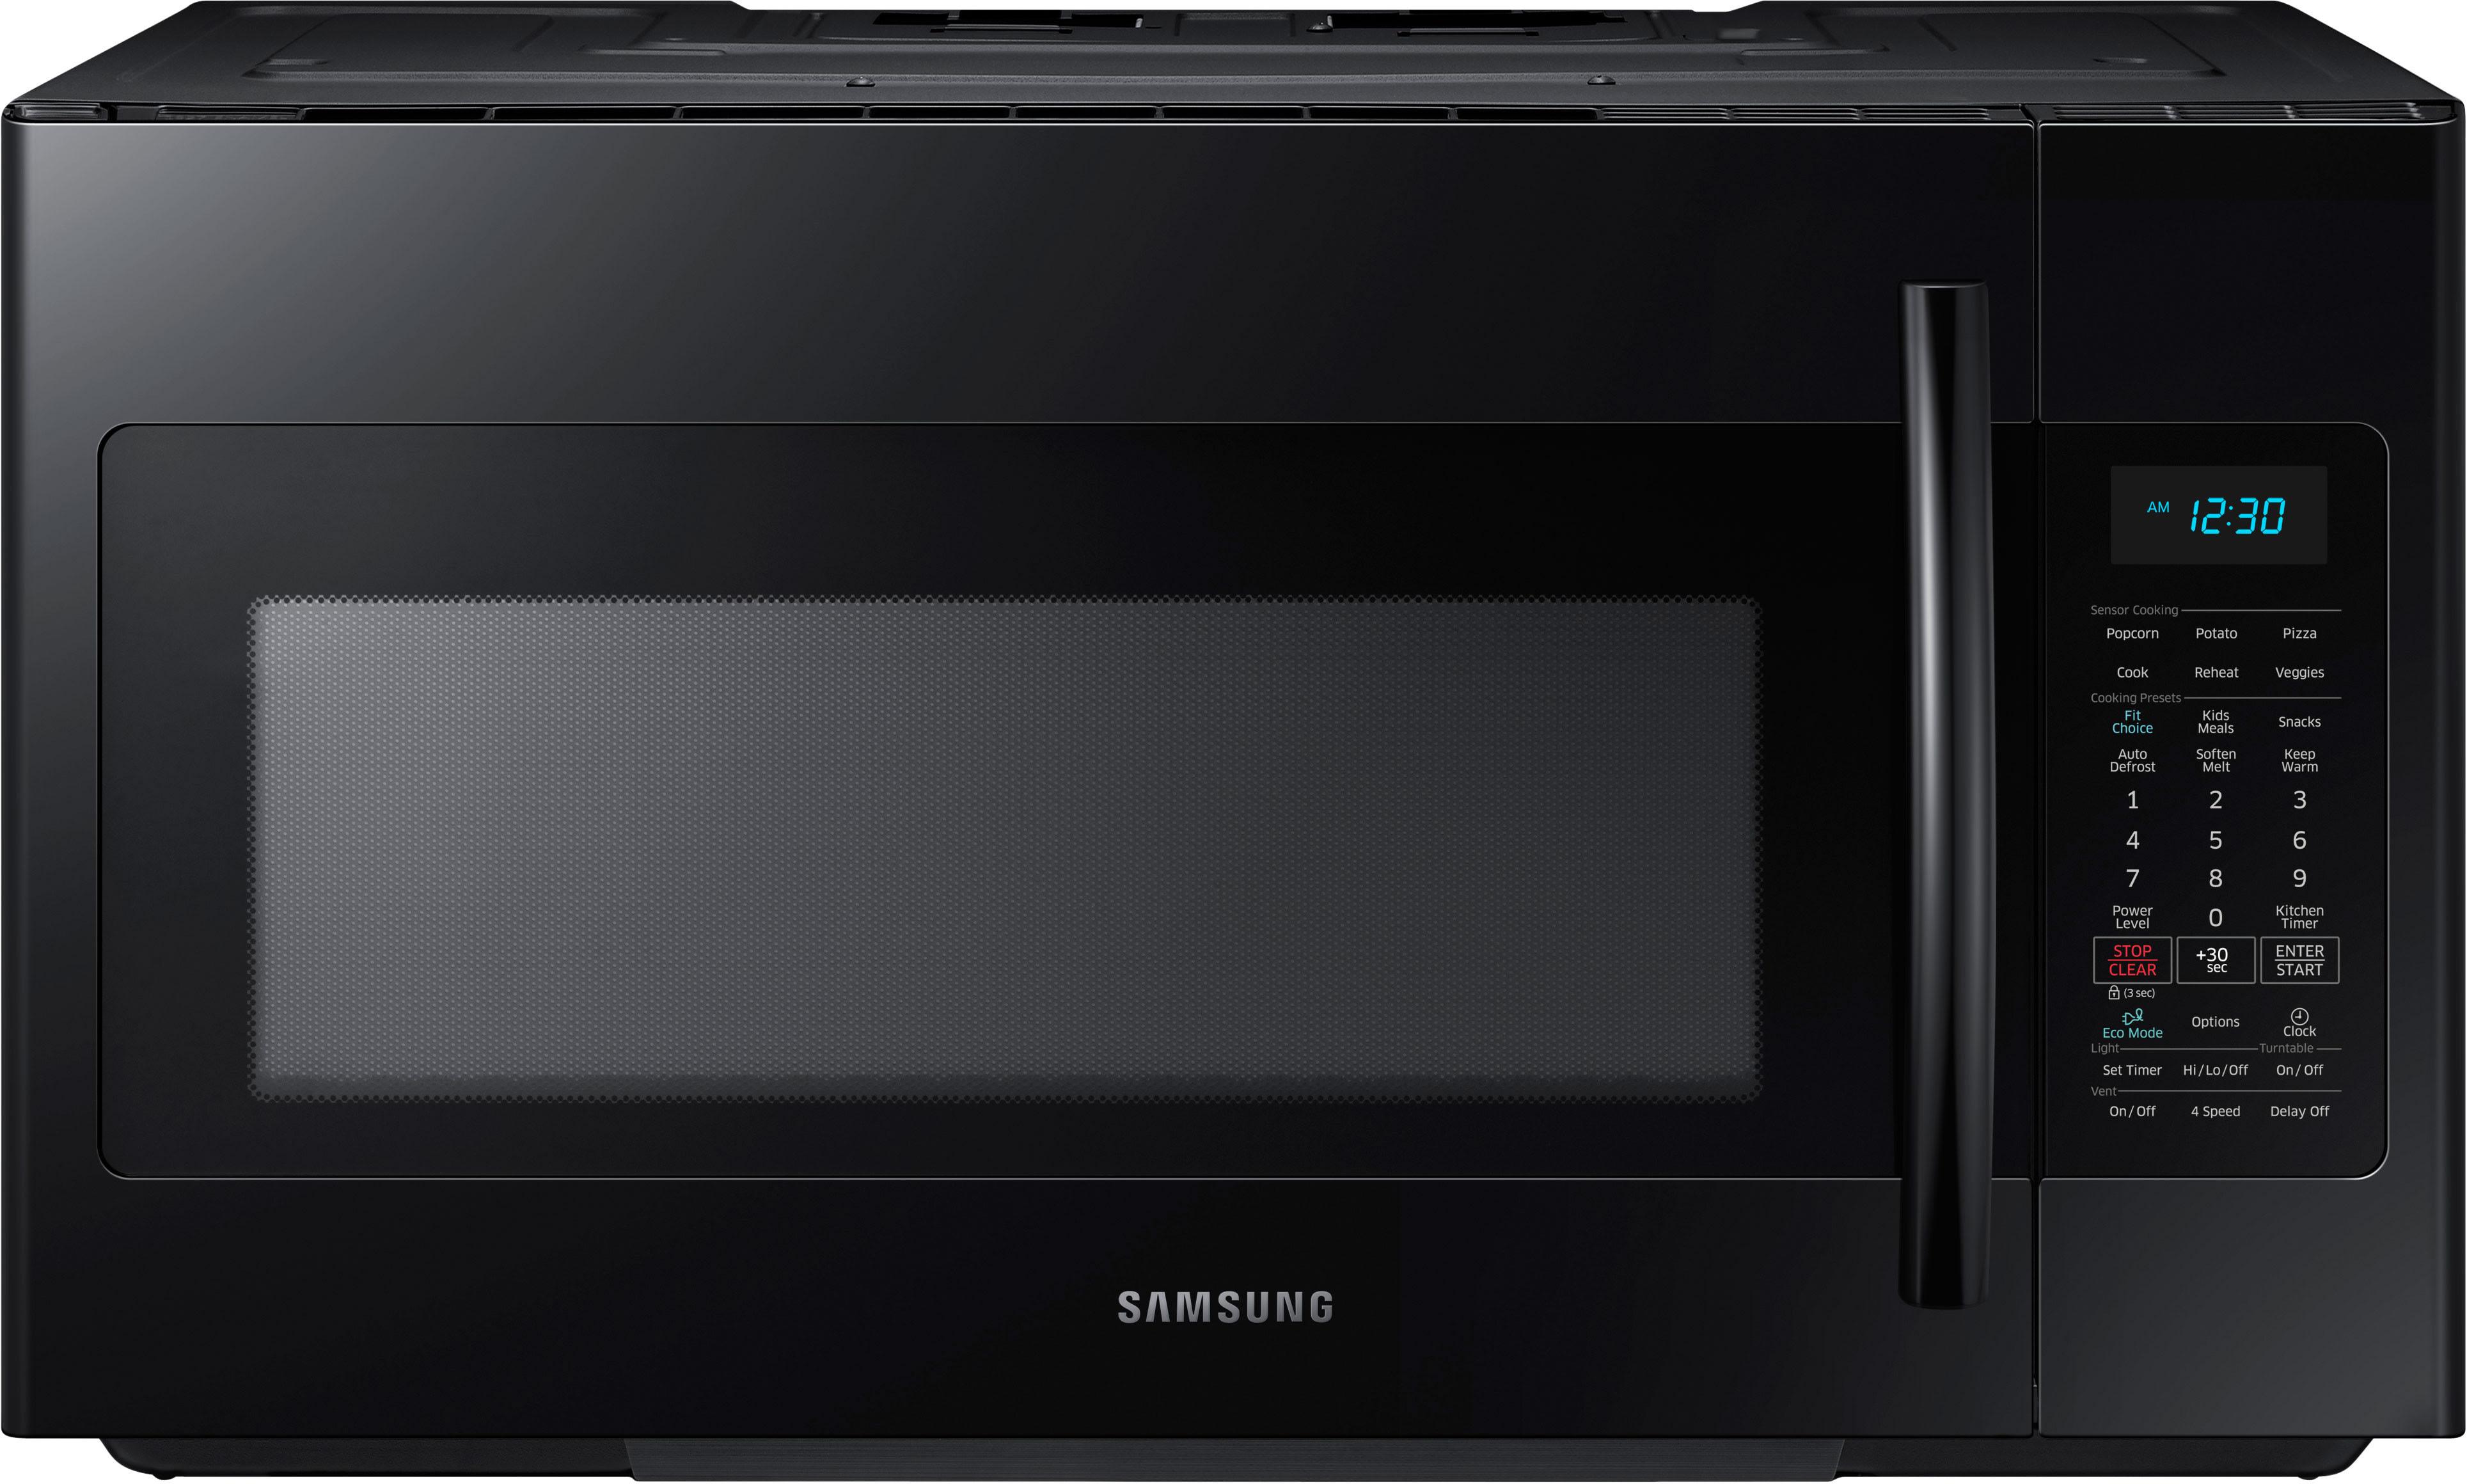 Samsung Nx58f5500sb 30 Inch Freestanding Gas Range With 5